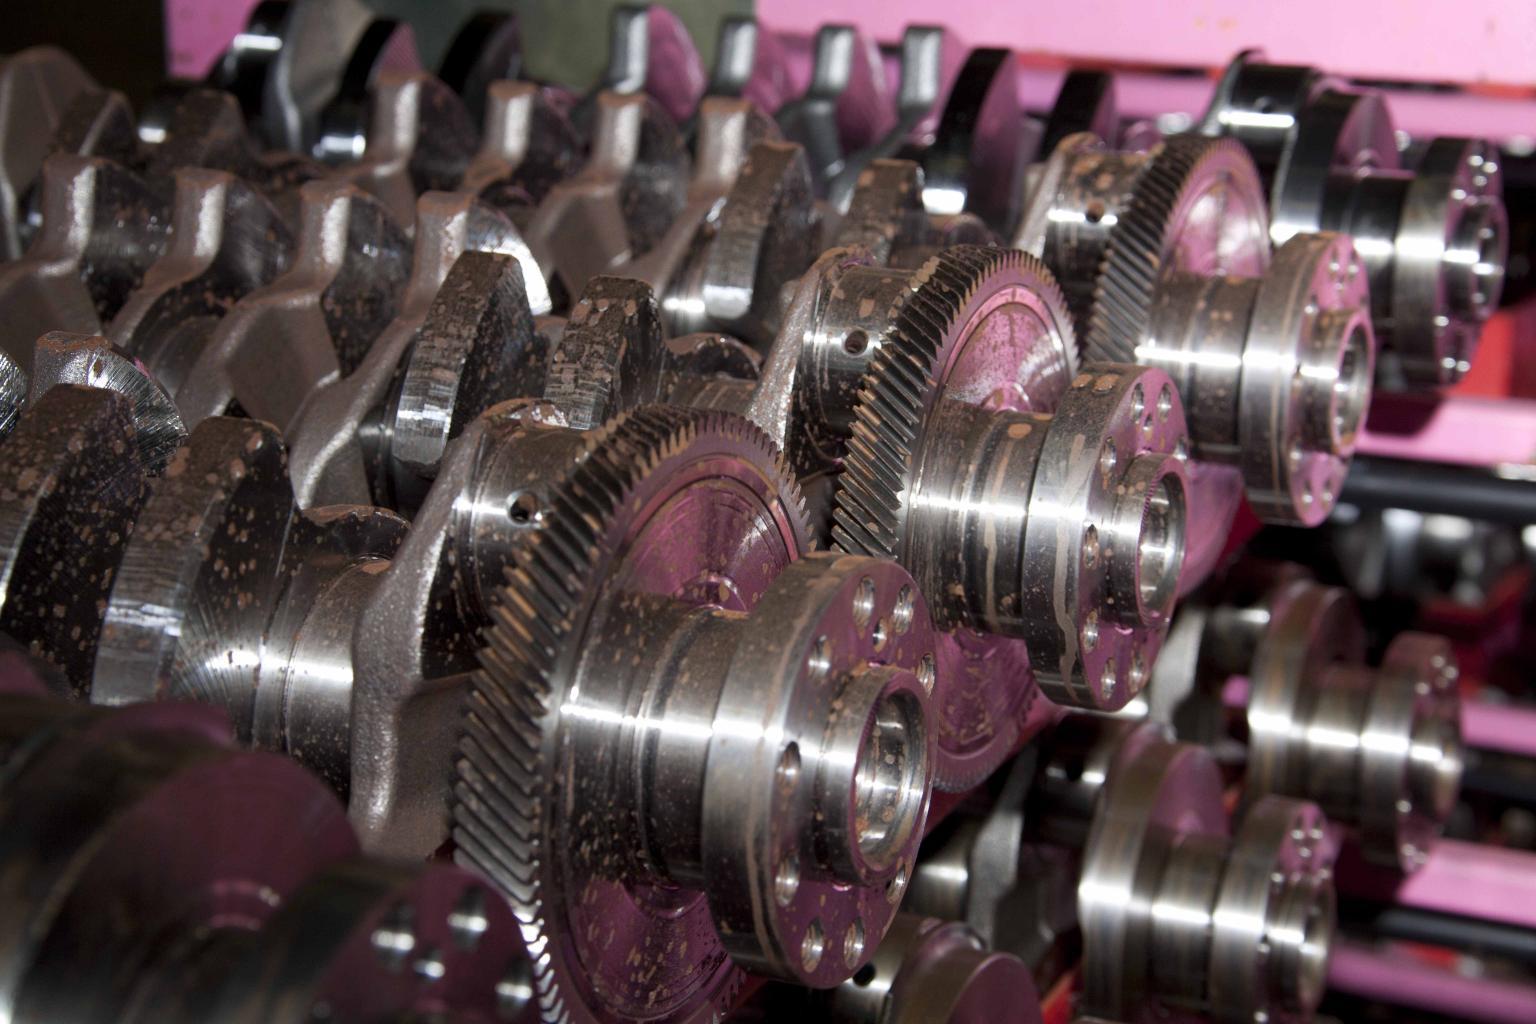 Shrink-bonding application on the Volvo engine